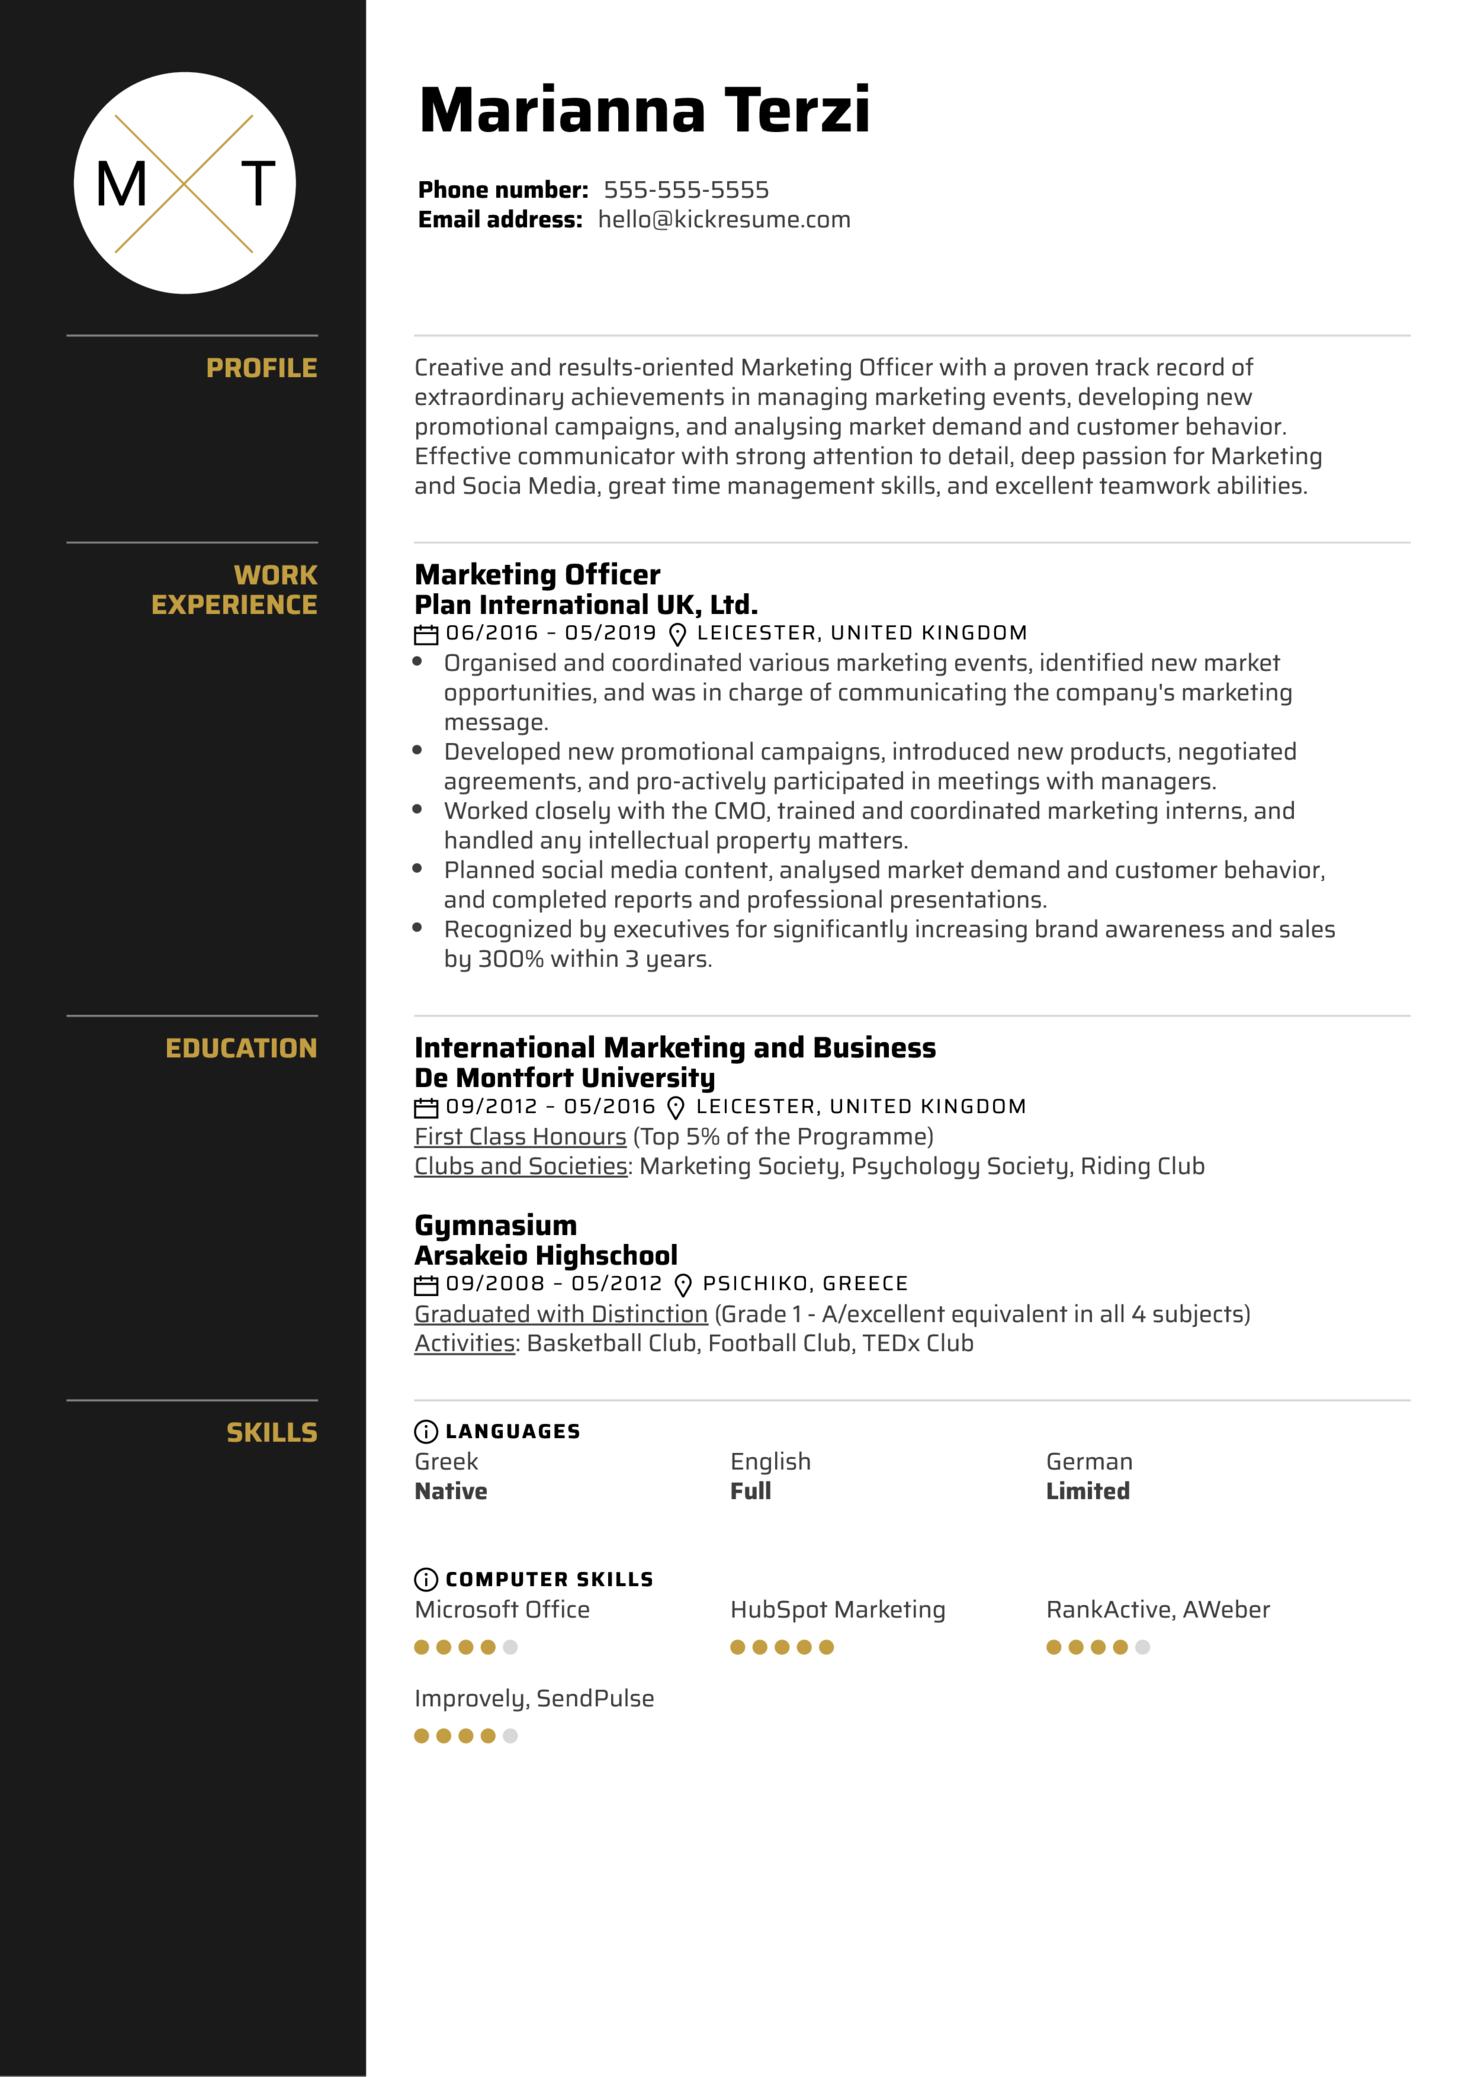 Marketing Officer Resume Sample (parte 1)